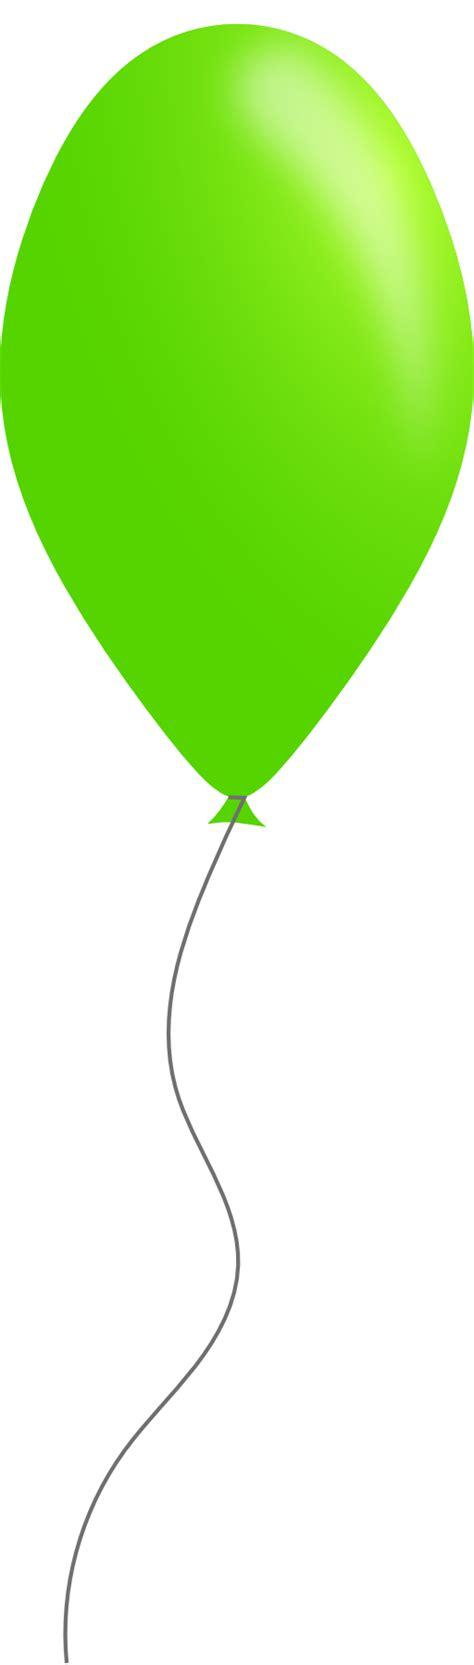 palloncini clipart baloon clip clipart best